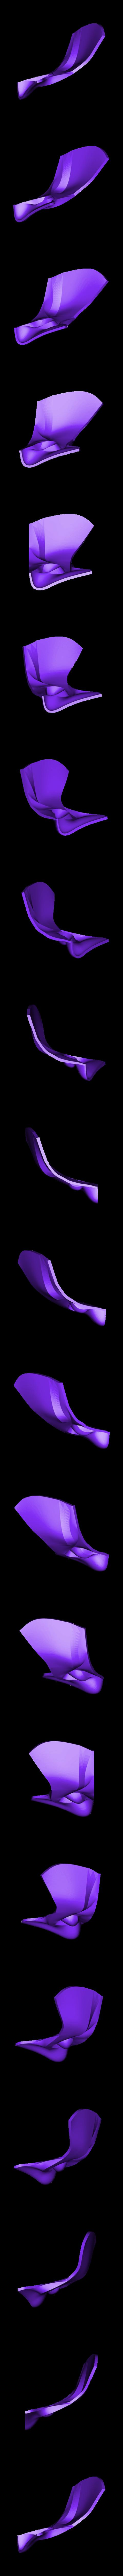 Part_4.stl Download free STL file Samurai Half Mask (Mempo) • Model to 3D print, VillainousPropShop